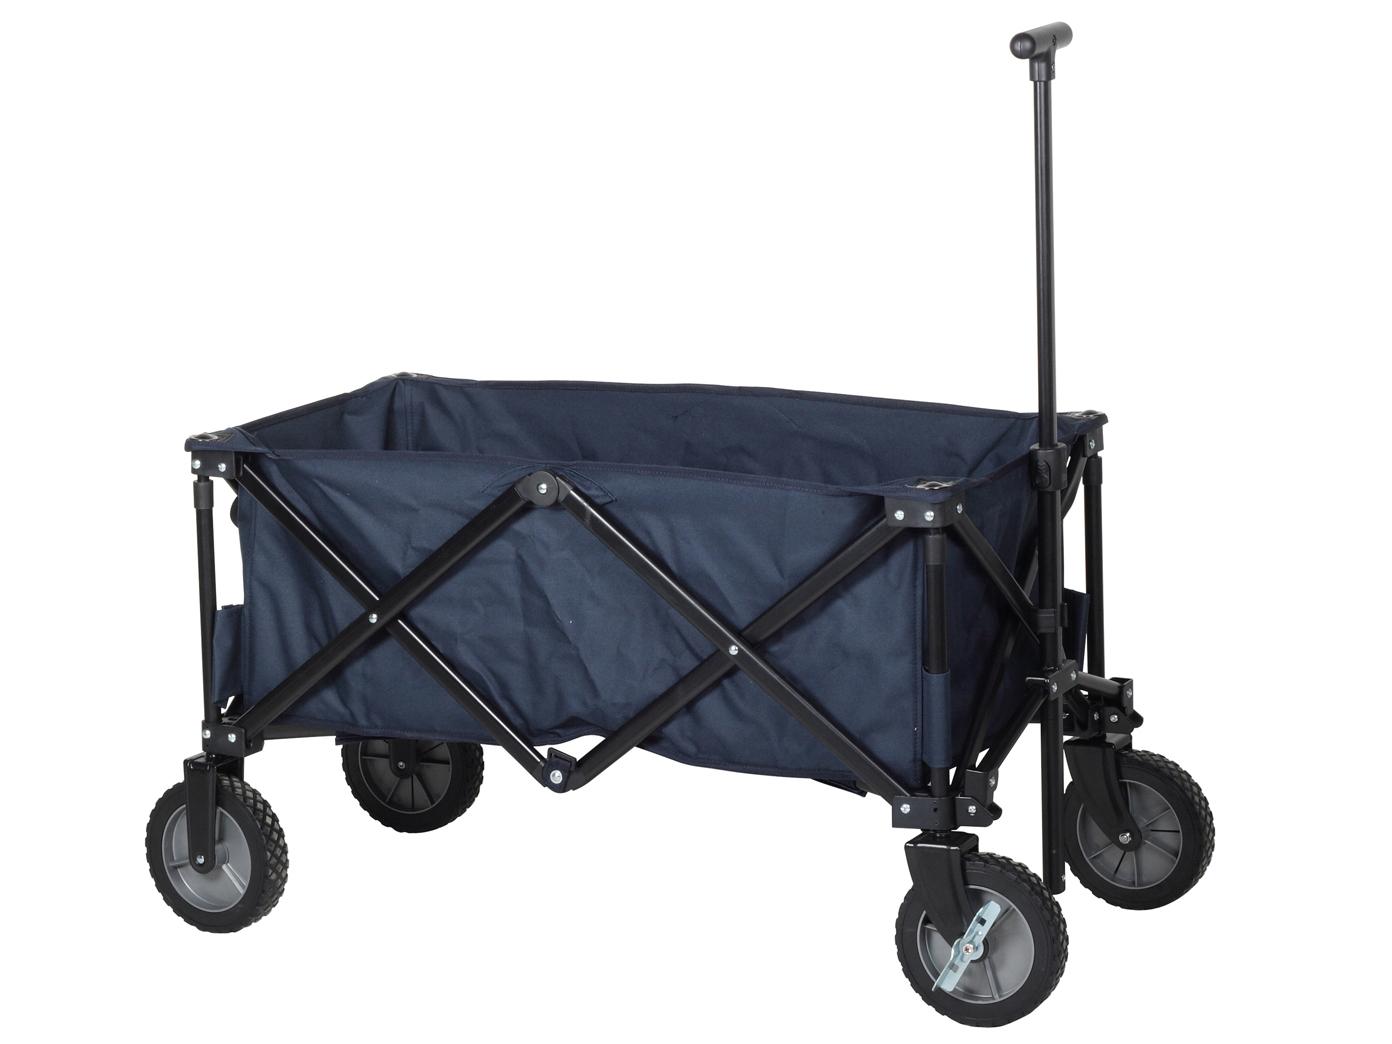 bollerwagen faltbar klappbar handwagen transportkarre kinder transportwagen eur 94 49. Black Bedroom Furniture Sets. Home Design Ideas